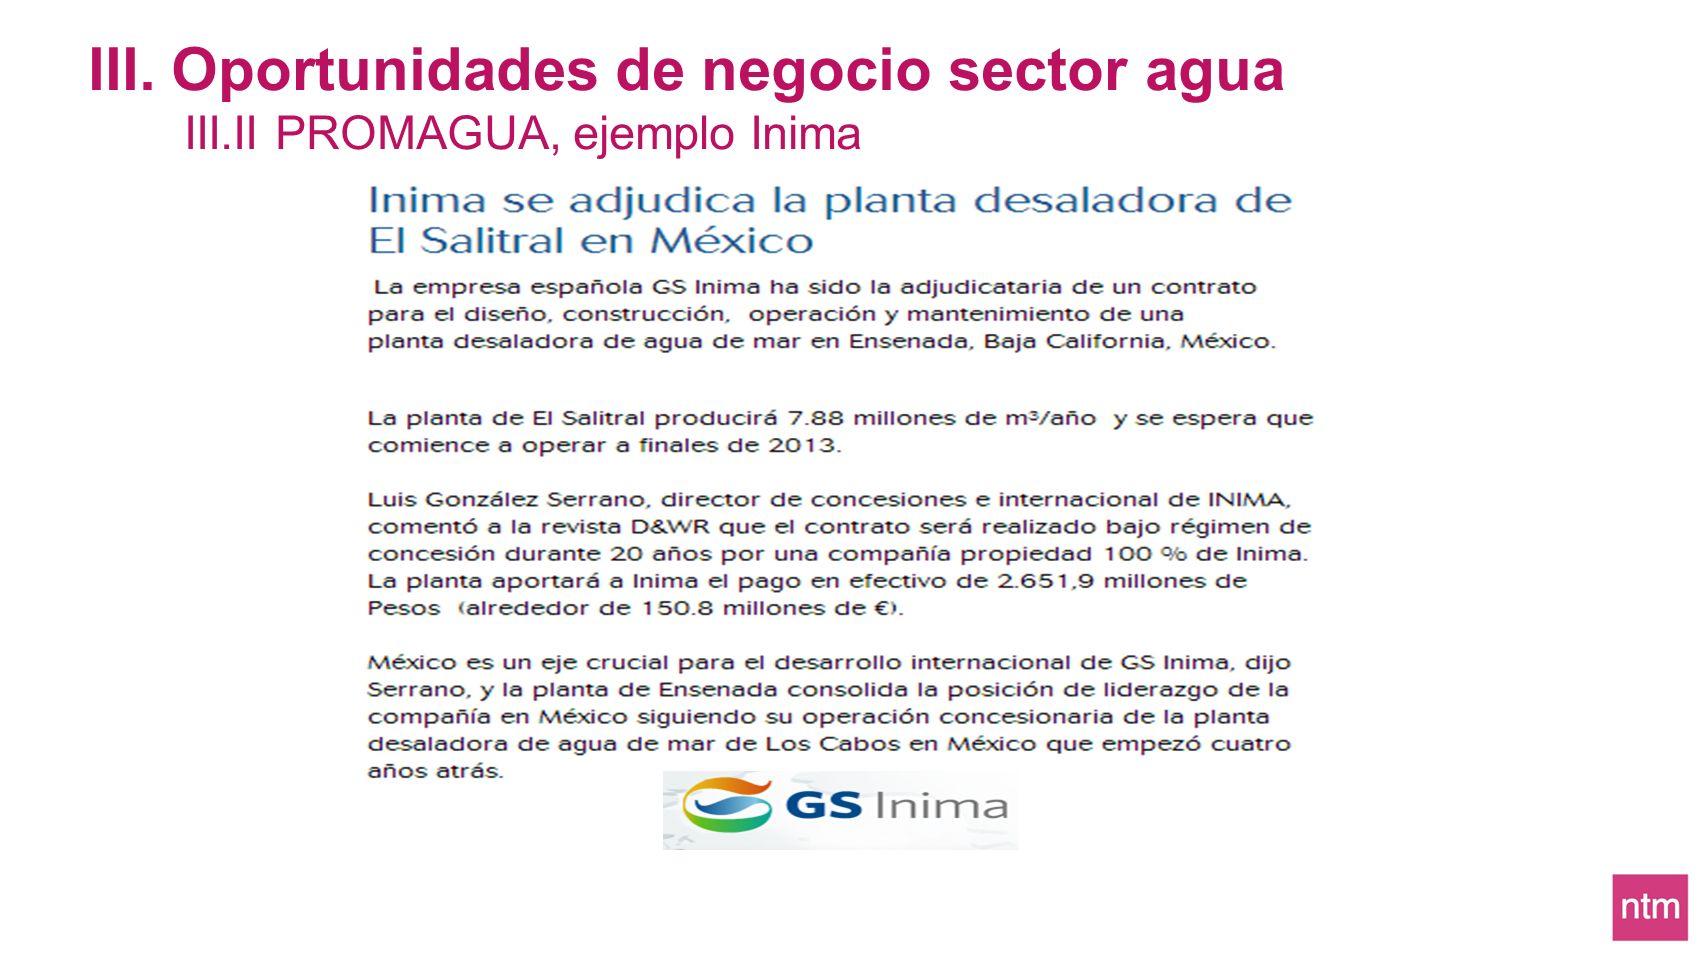 III. Oportunidades de negocio sector agua III.II PROMAGUA, ejemplo Inima